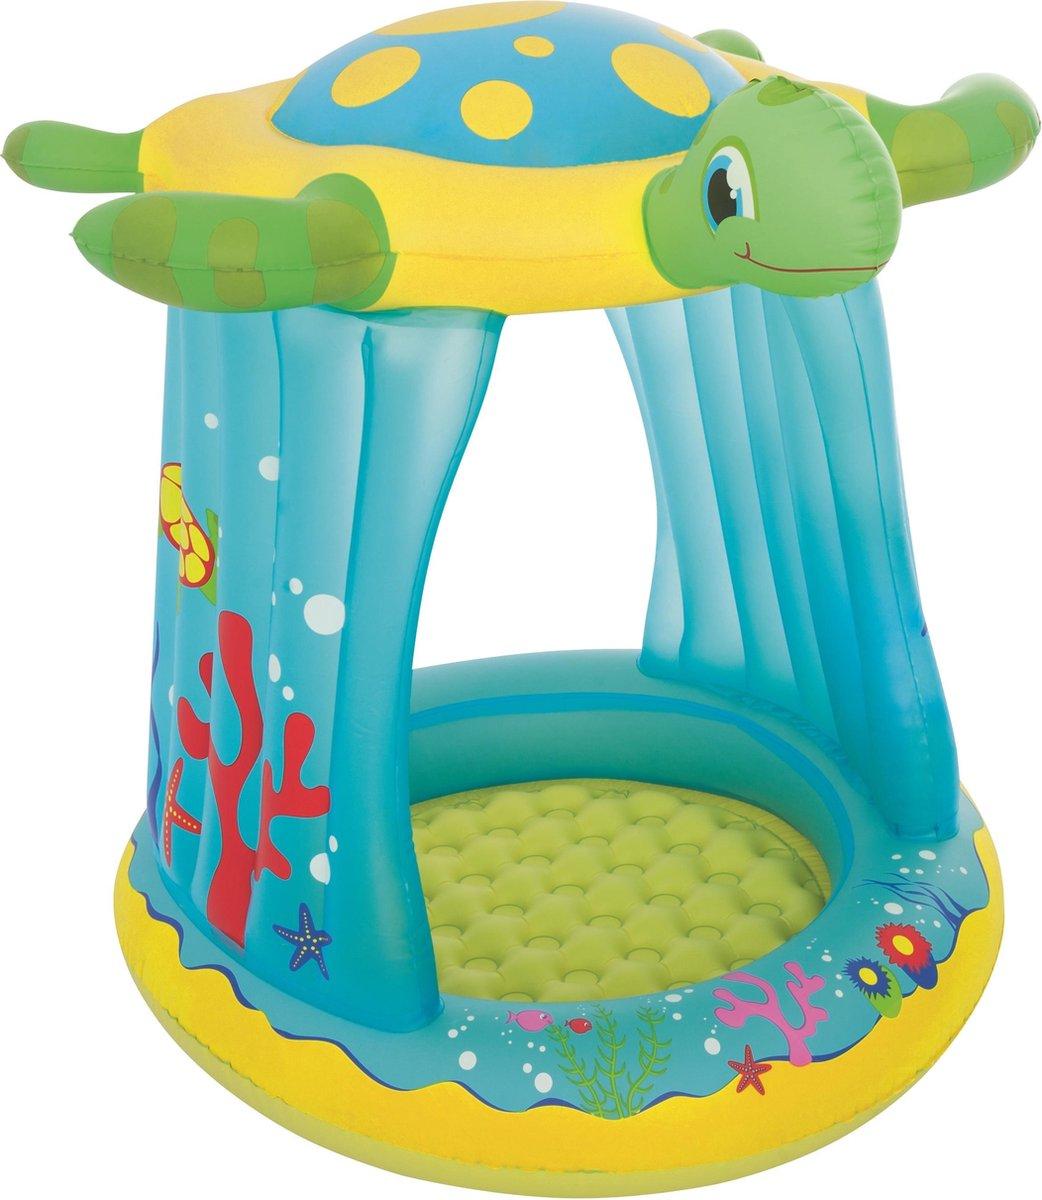 Bestway Babyzwembad Schildpad UV beschermend 109 x 96 x 104 cm - Kinderzwembad